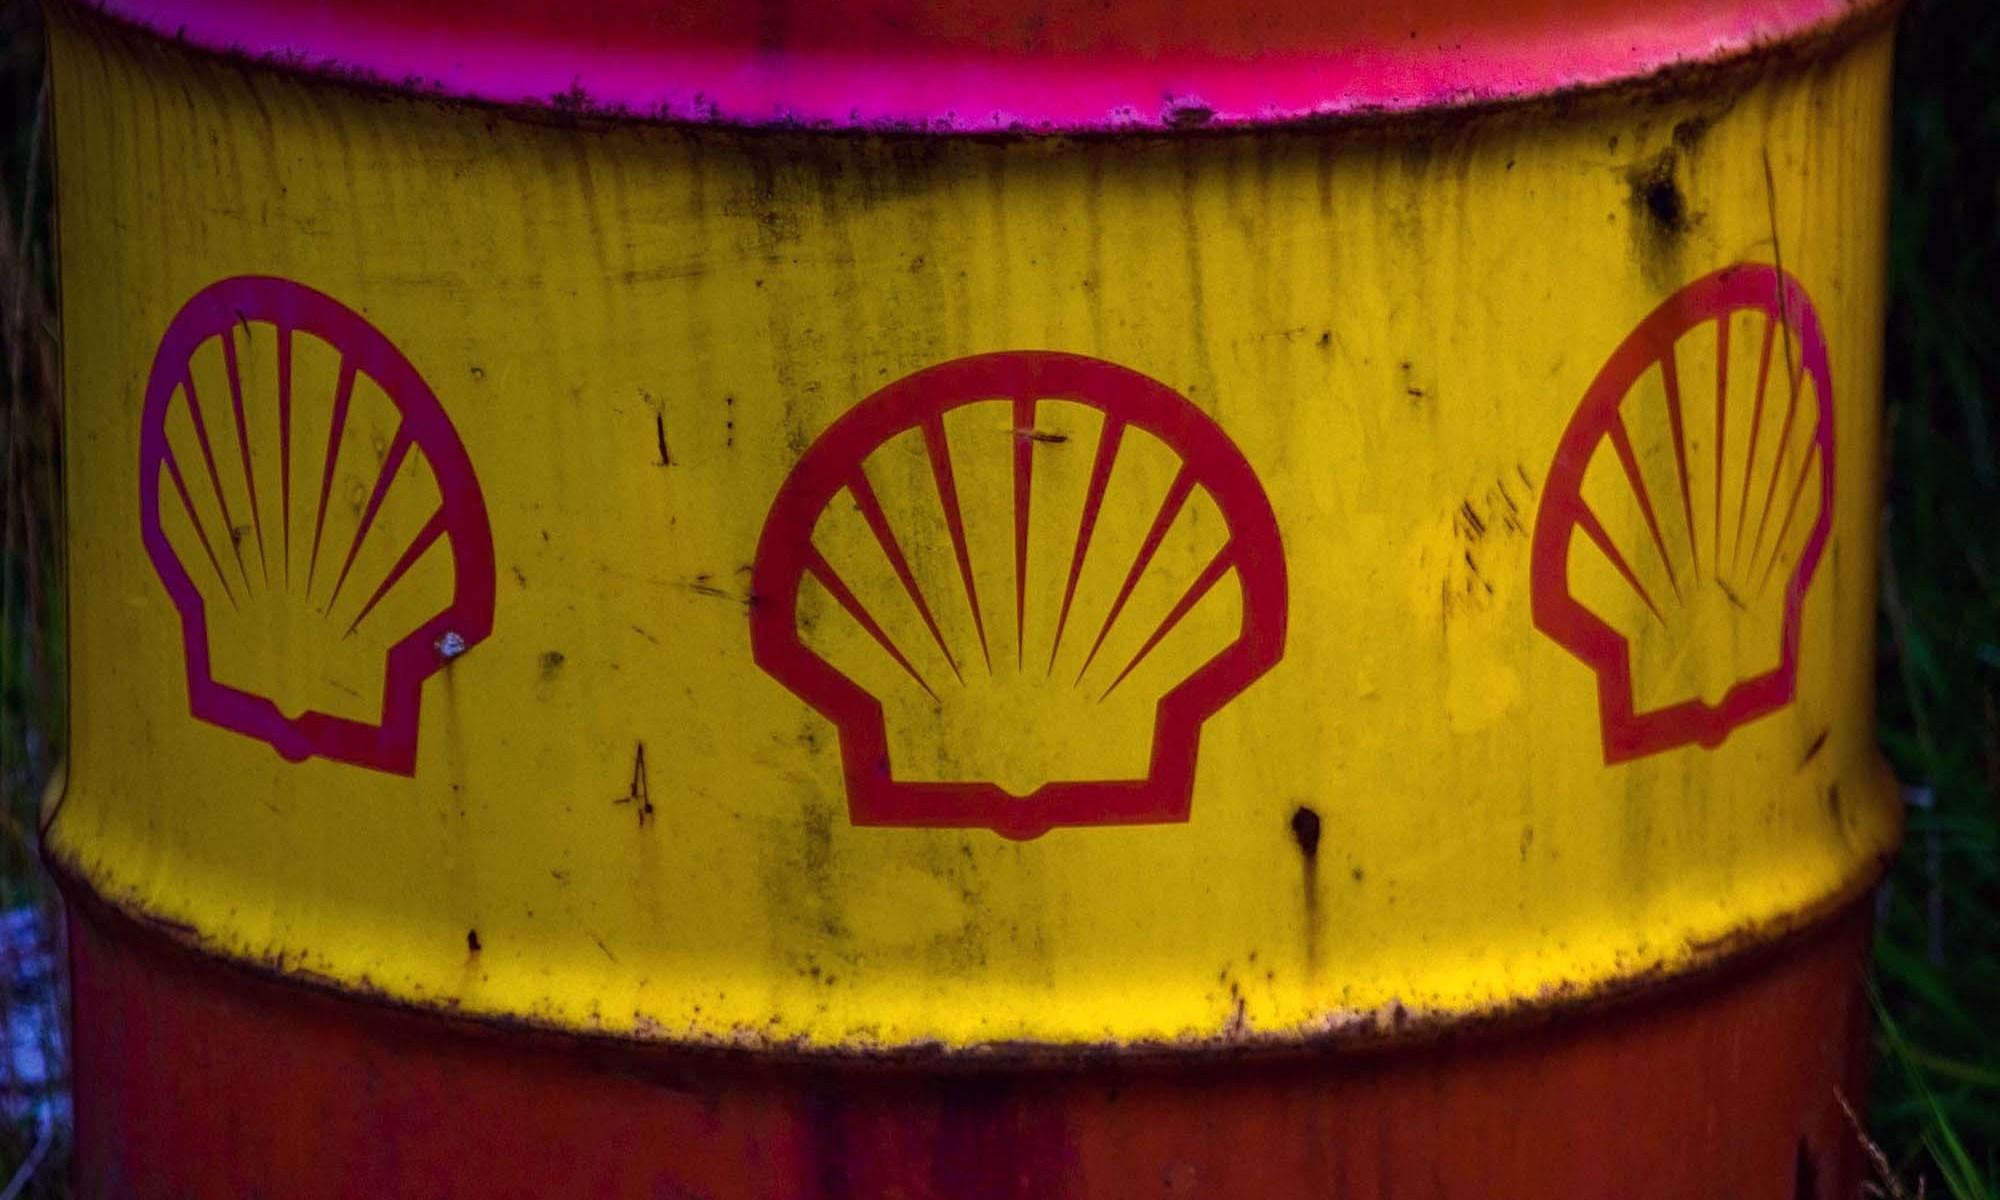 Old Shell Oil Barrel Detail